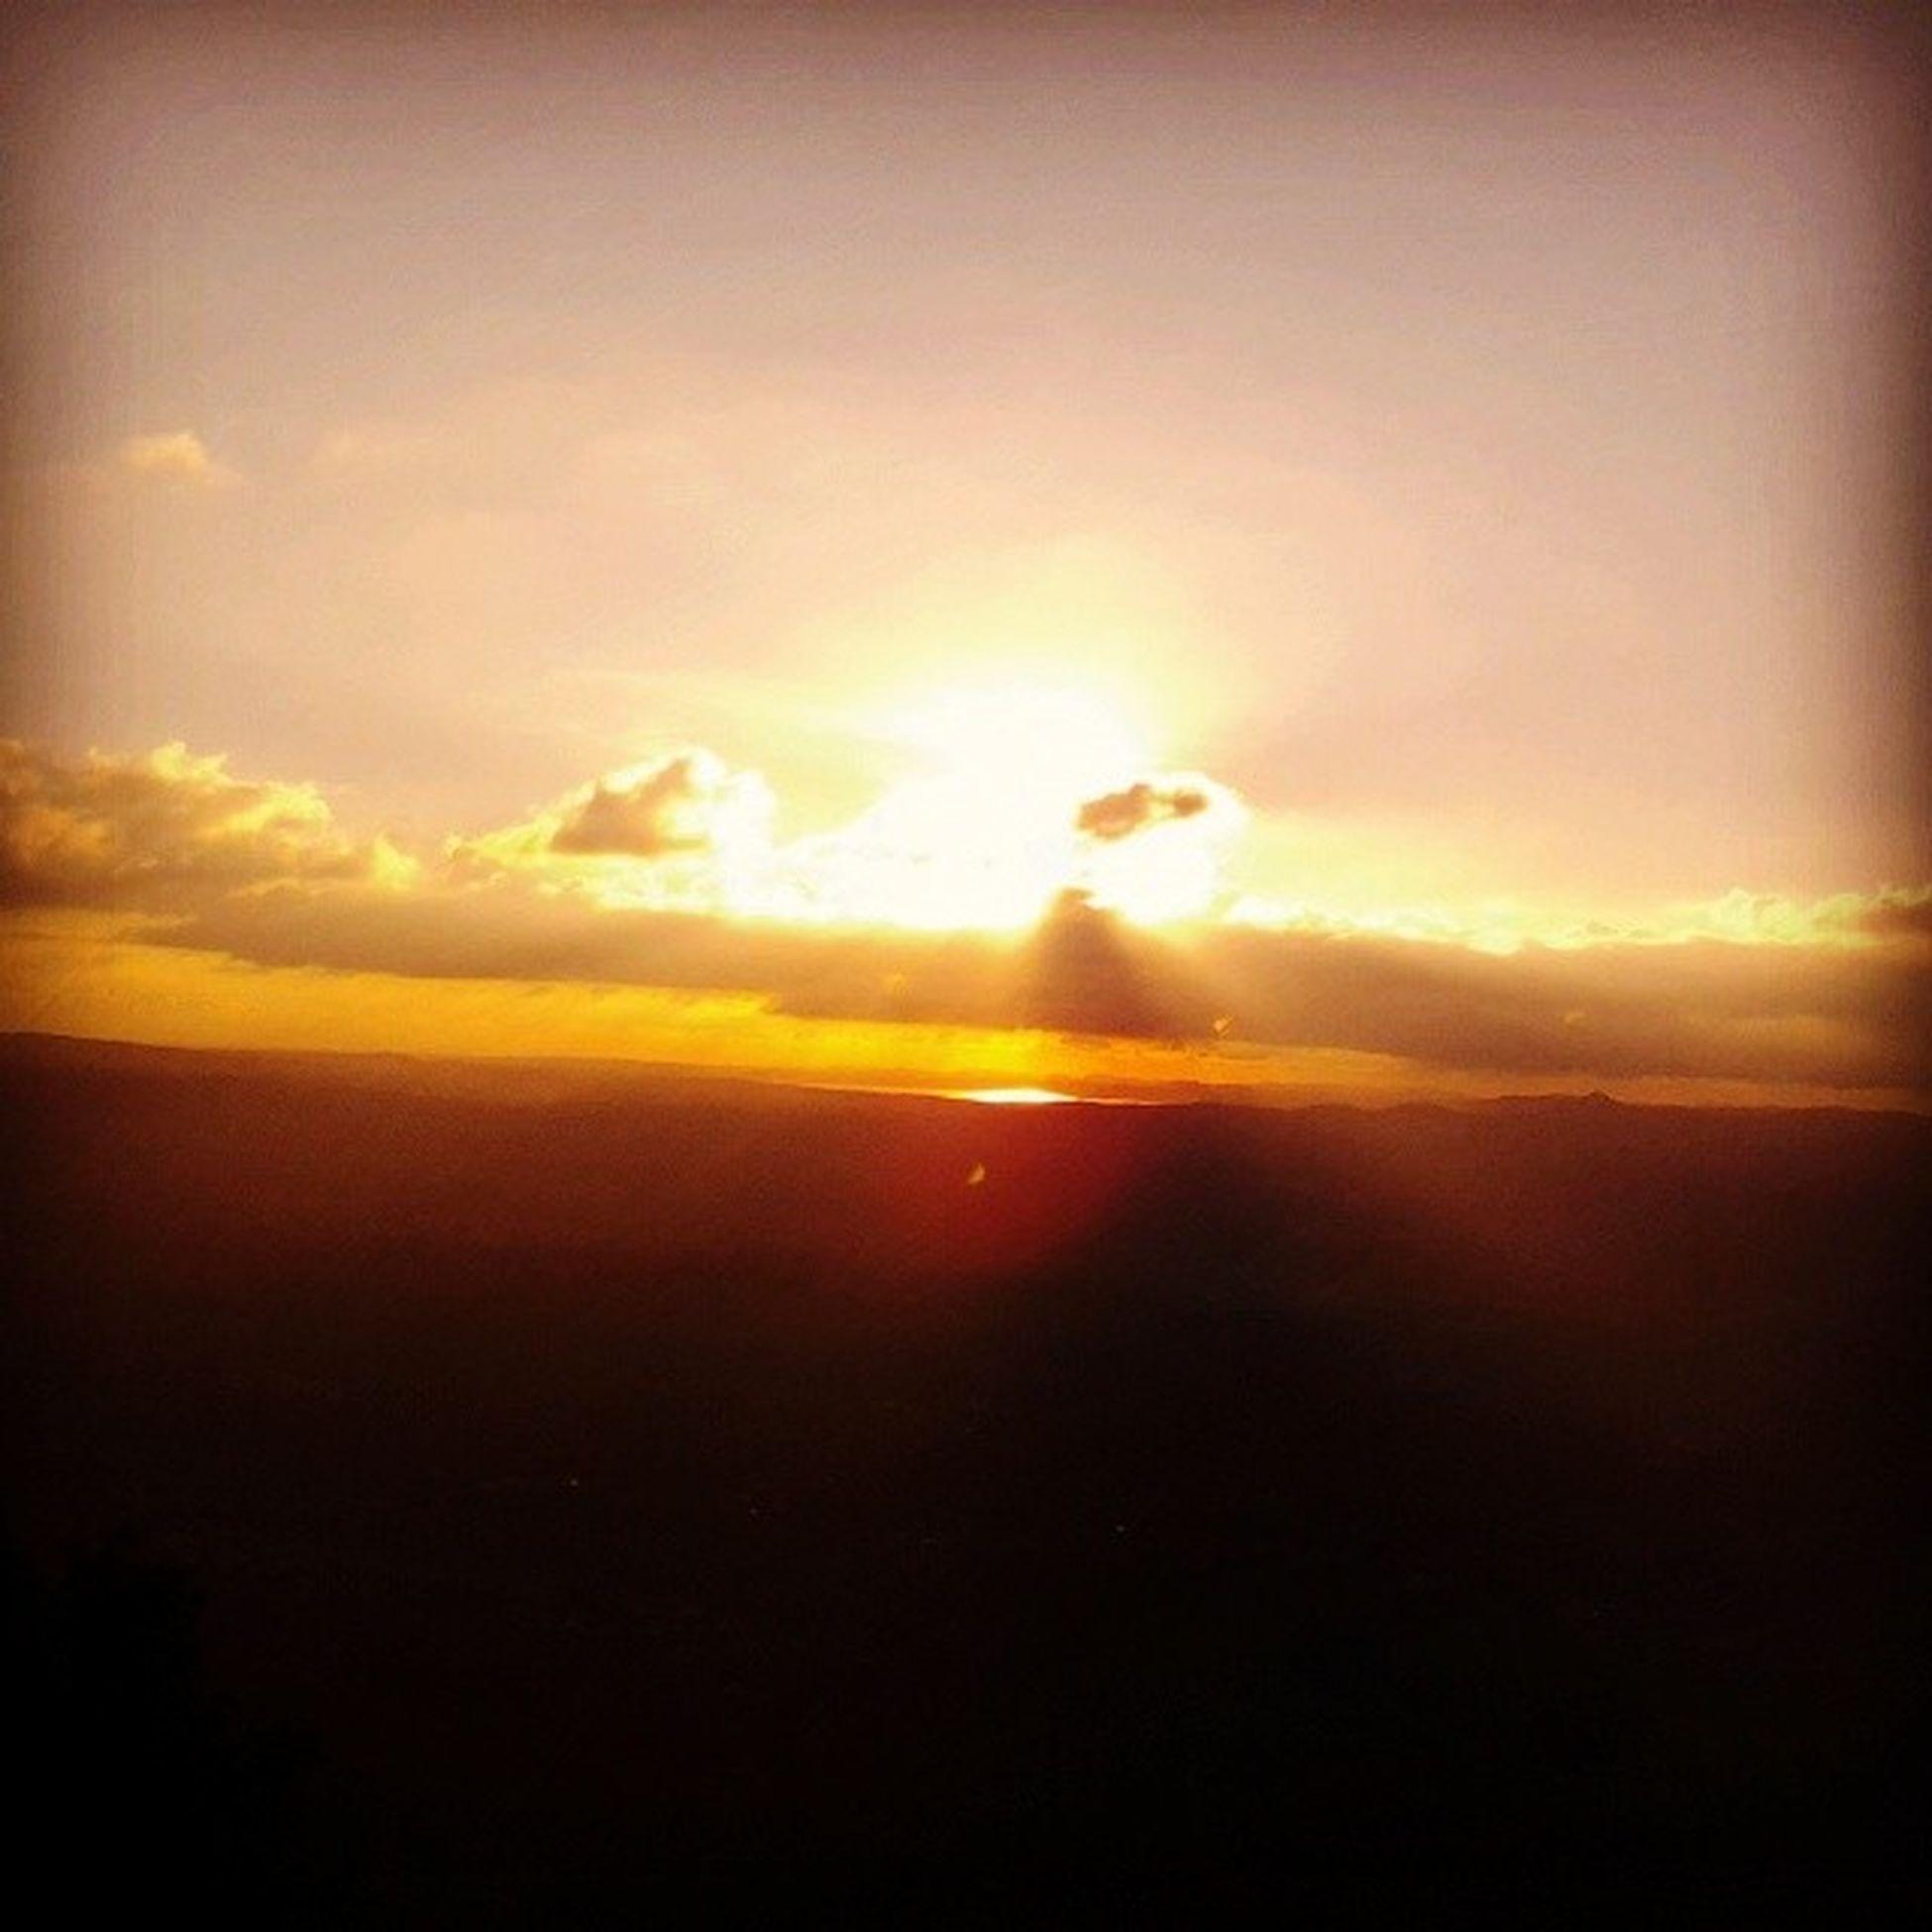 Tramonto Incima Vertigini Lake Clouds Paesaggio Cloudsporn Sunset Sunporn Sunpower